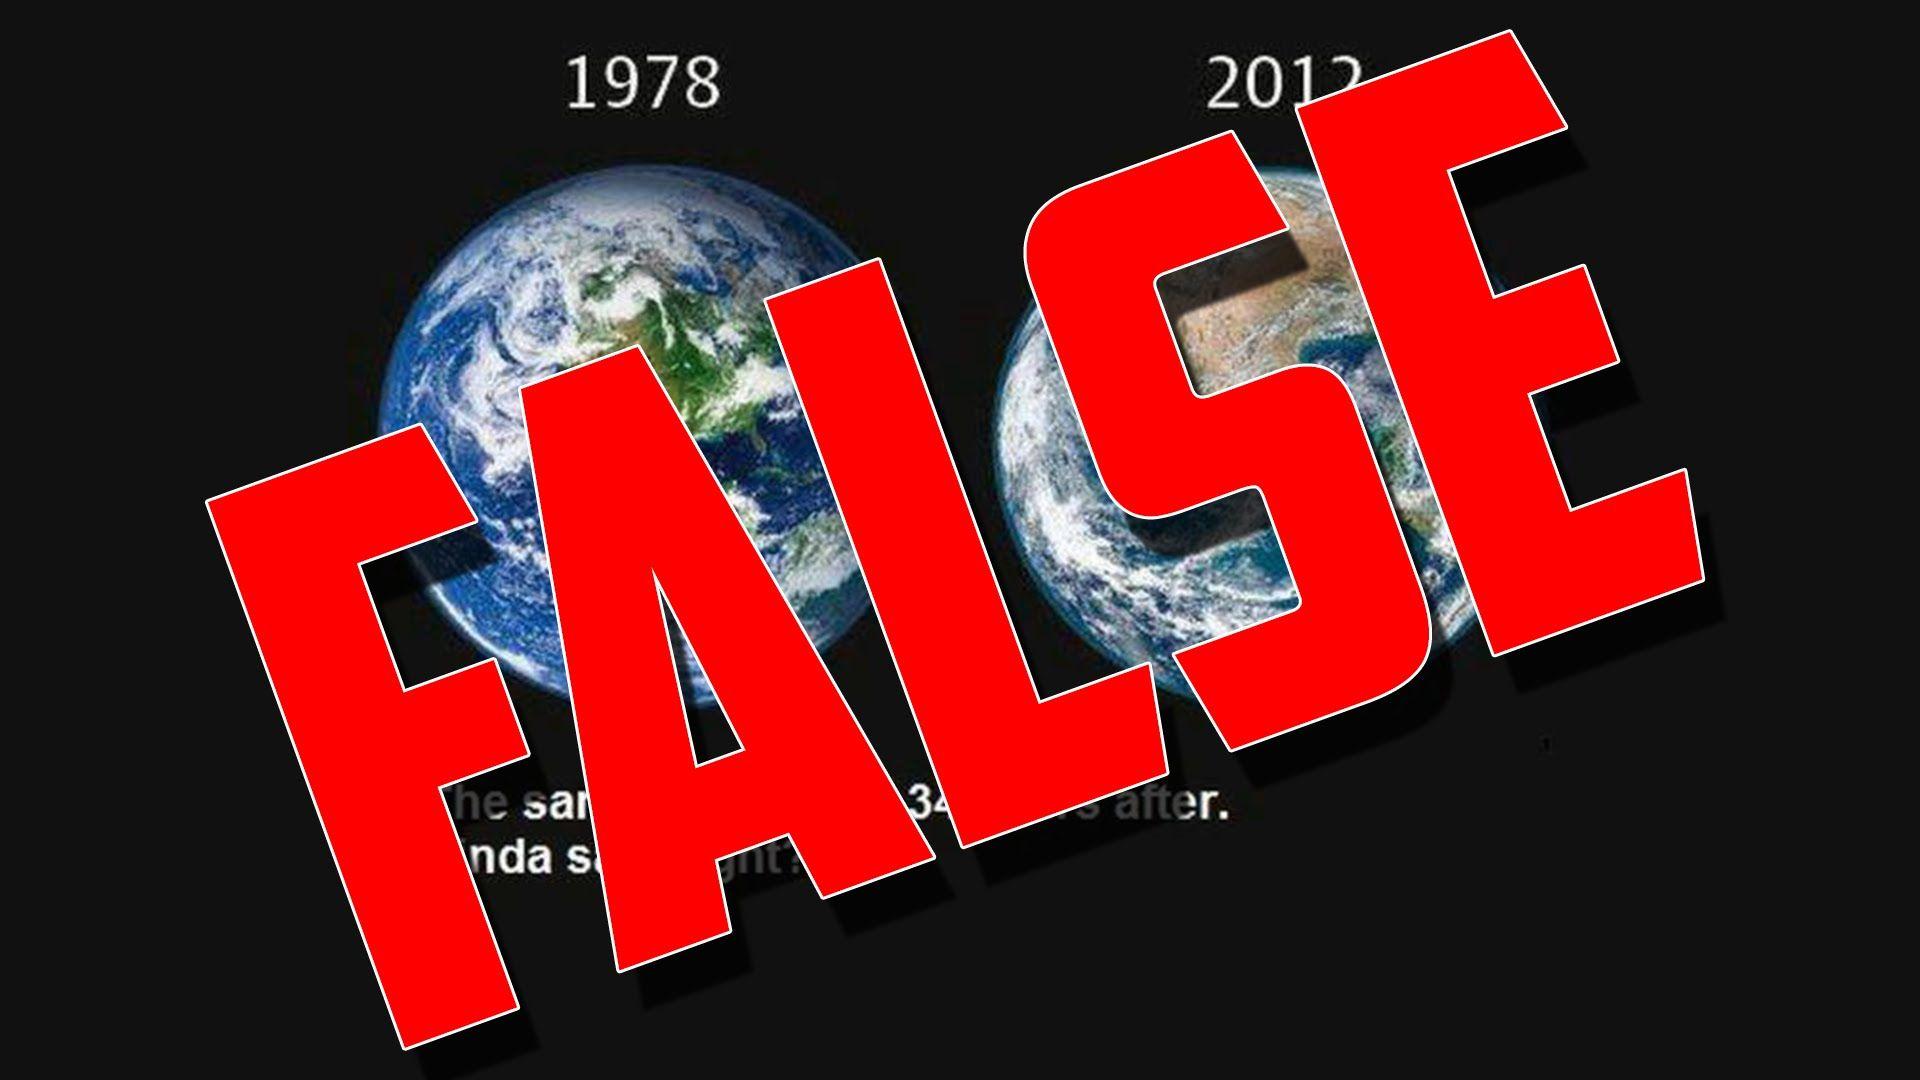 """2 Earths"" 1978 vs 2012 -The Awesomist Explains"